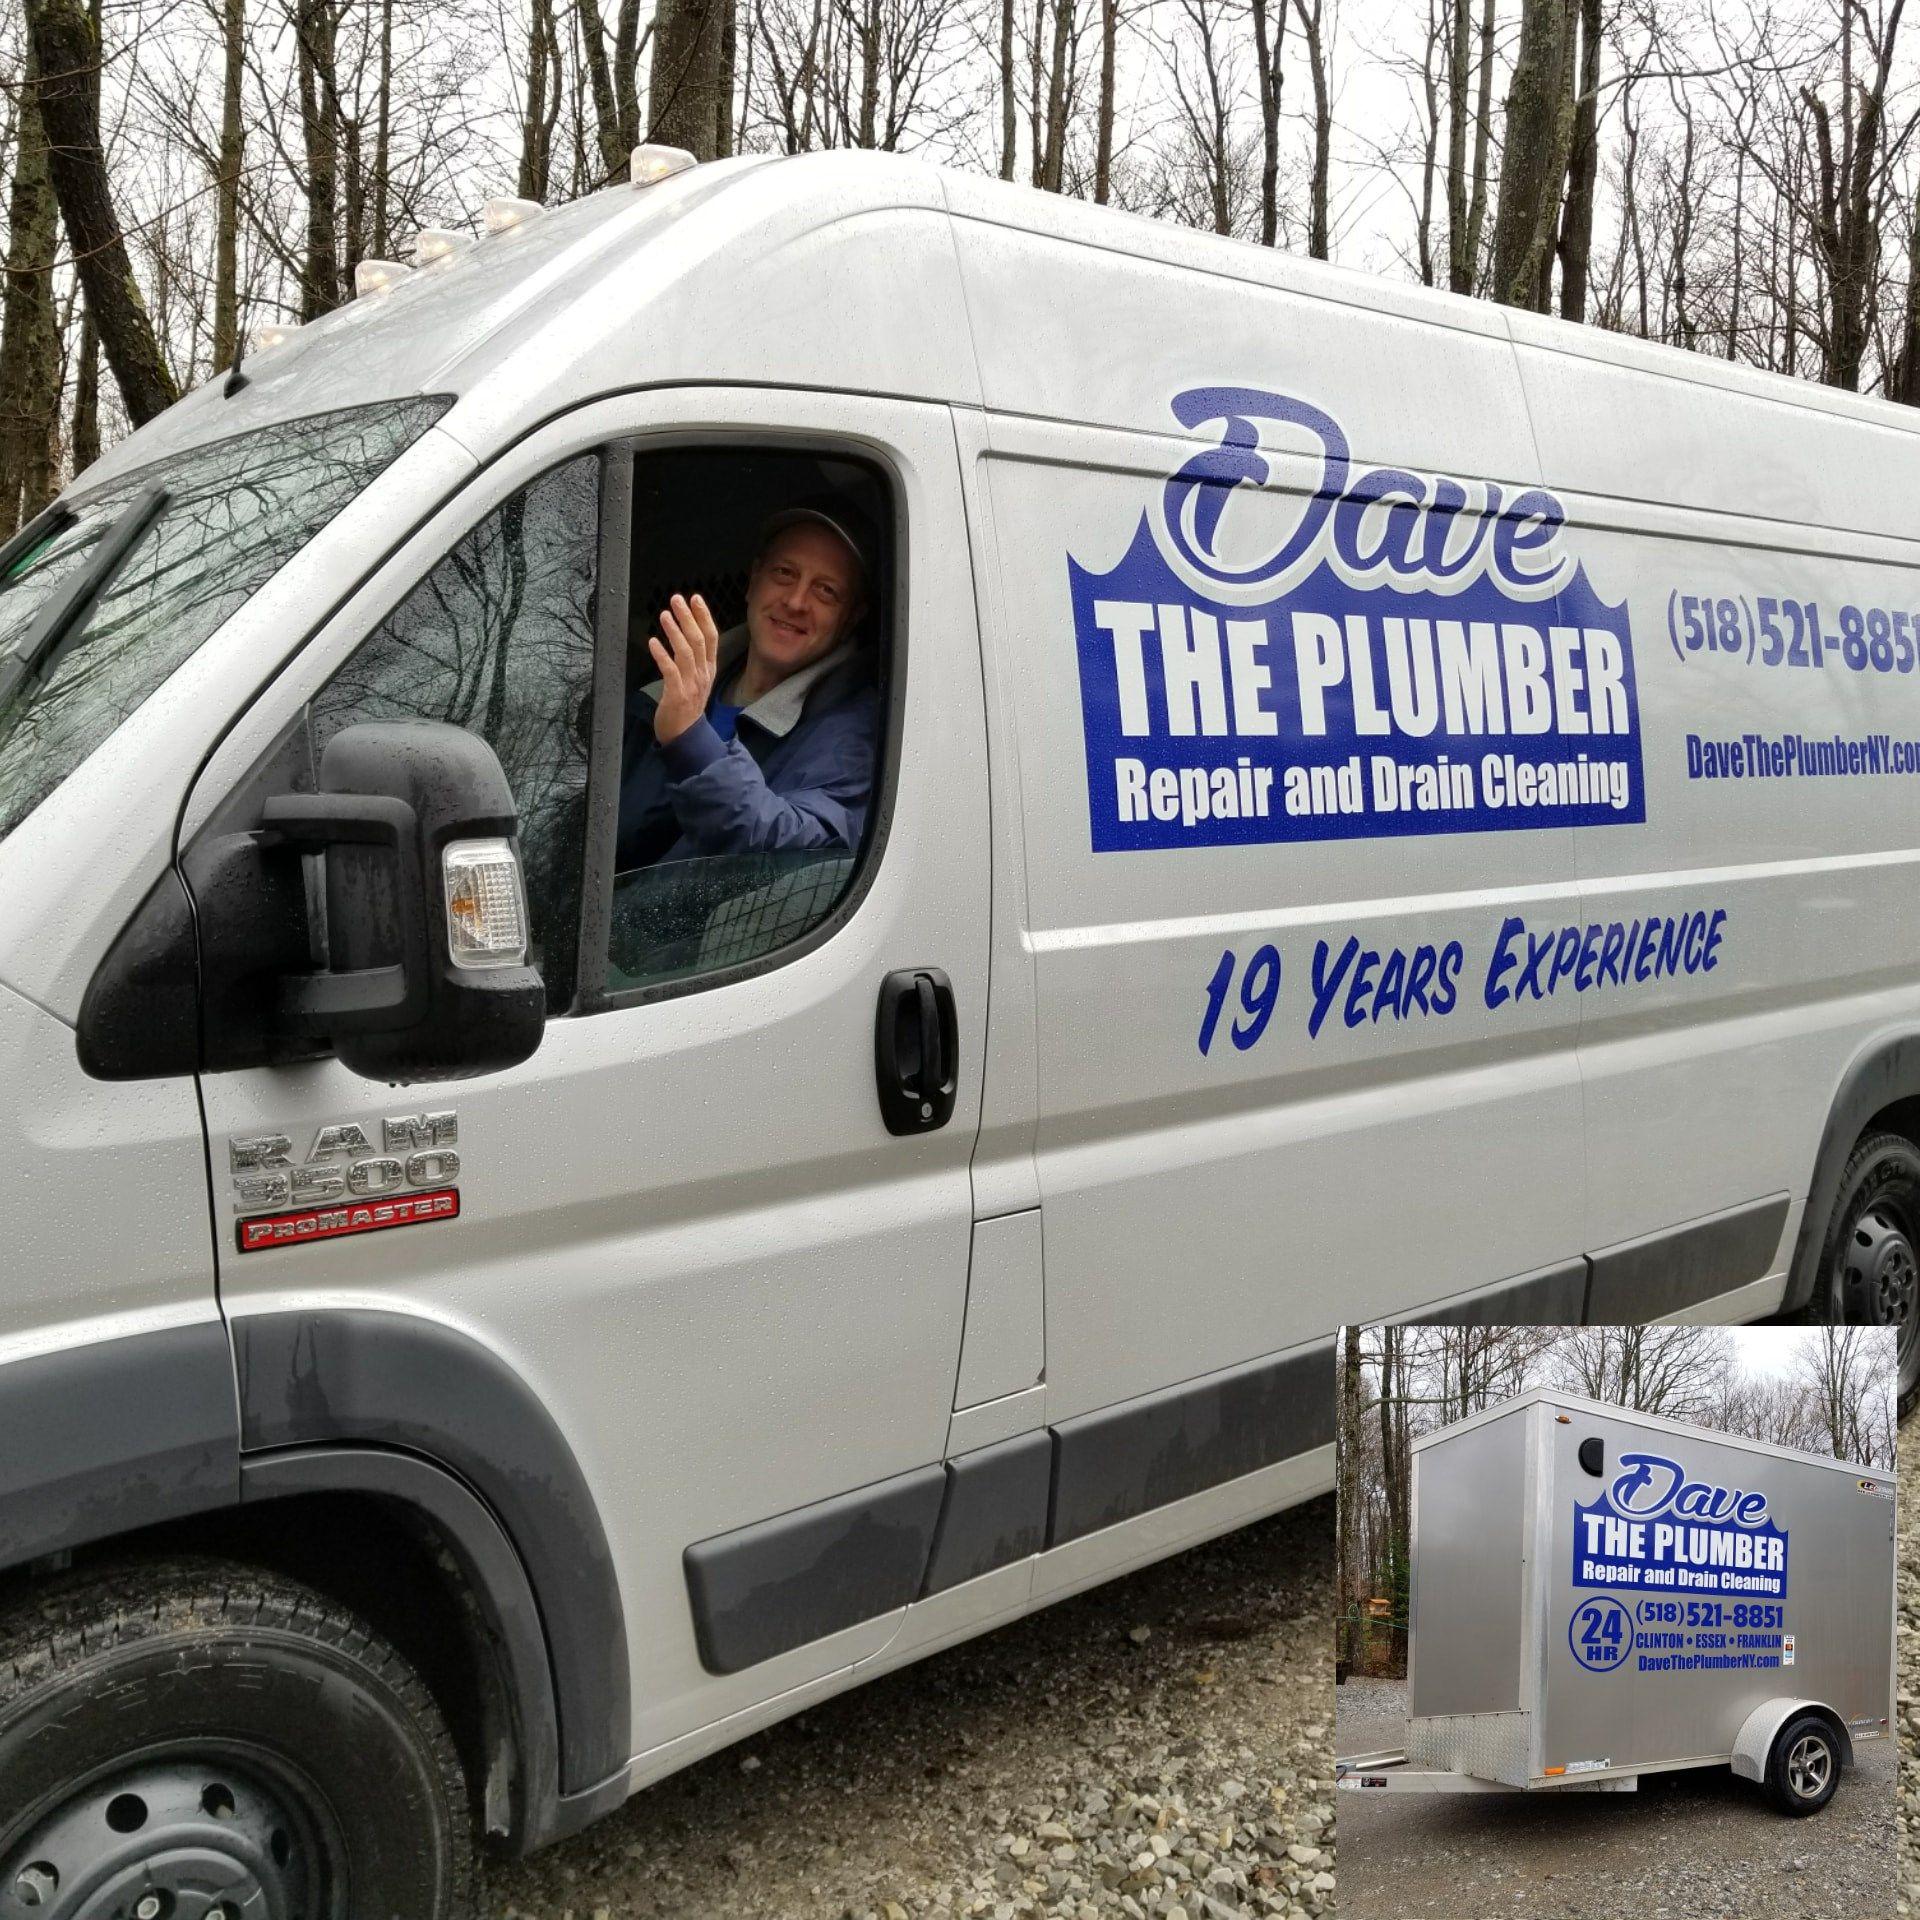 Dave The Plumber, 24Hr Plumbing